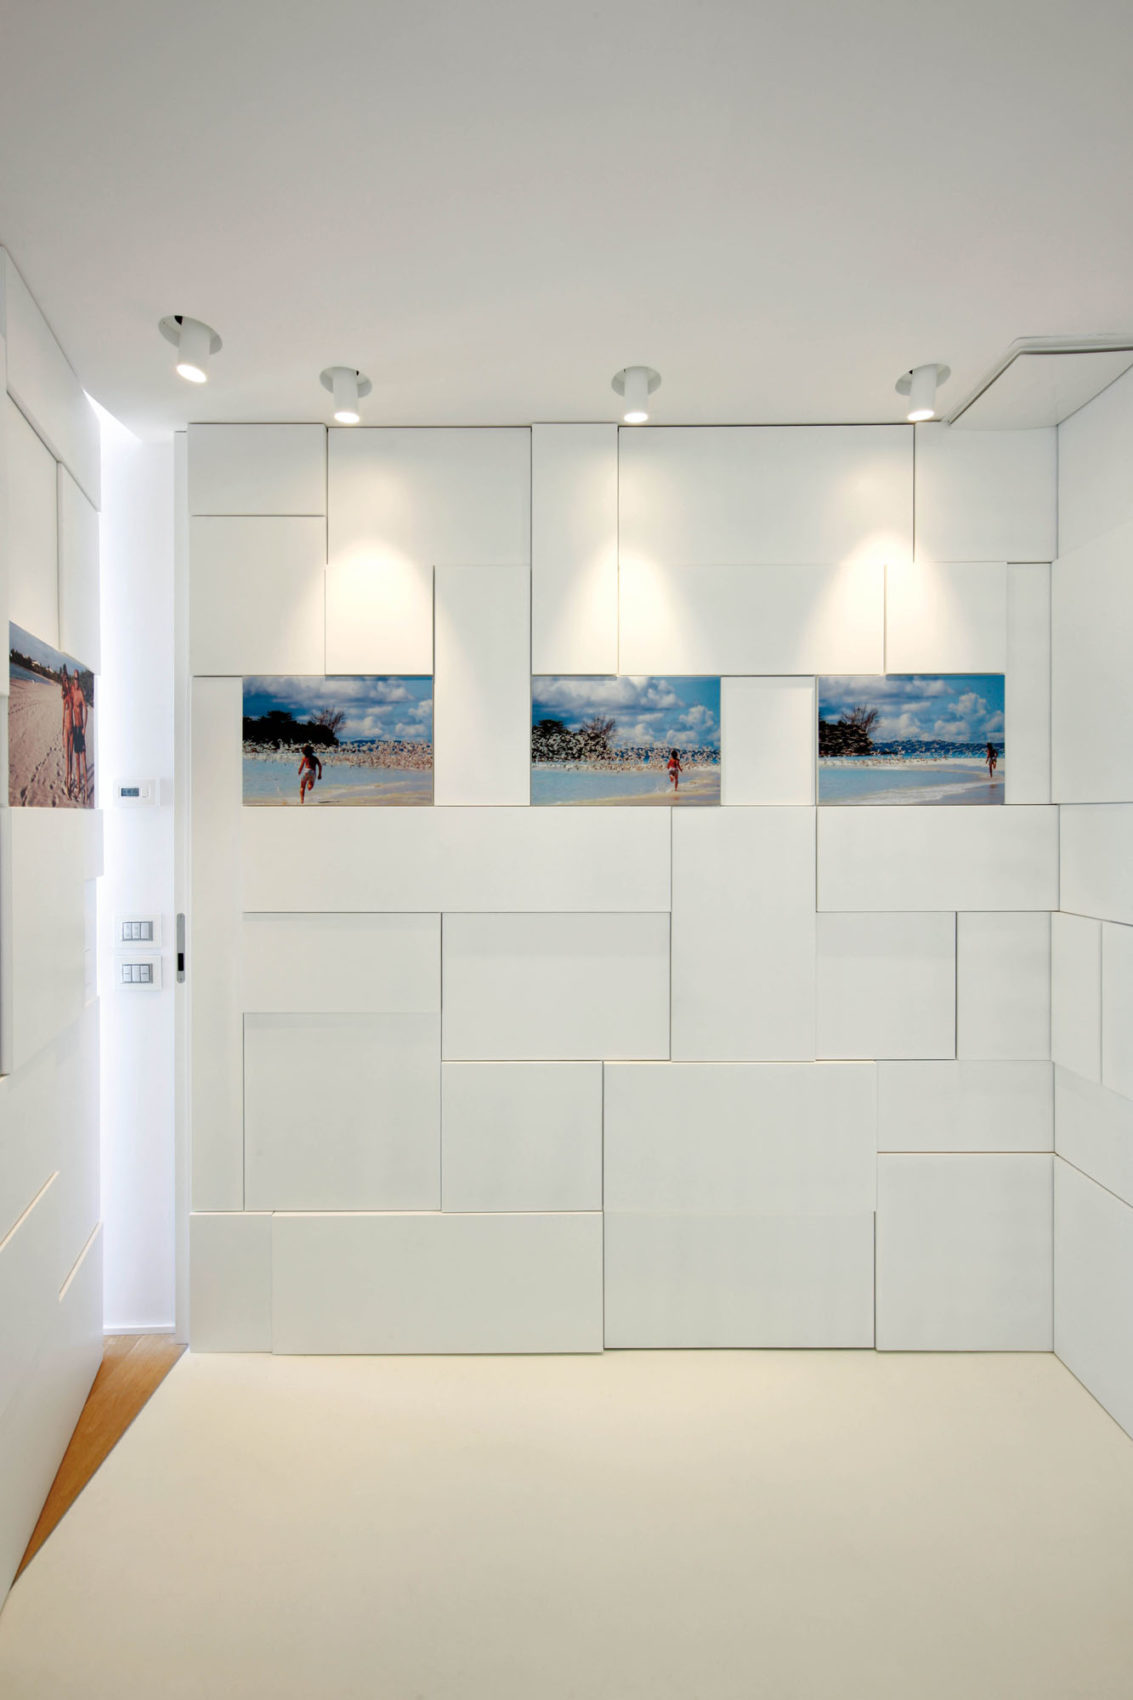 Casa Pina by Fabio Fantolino (14)